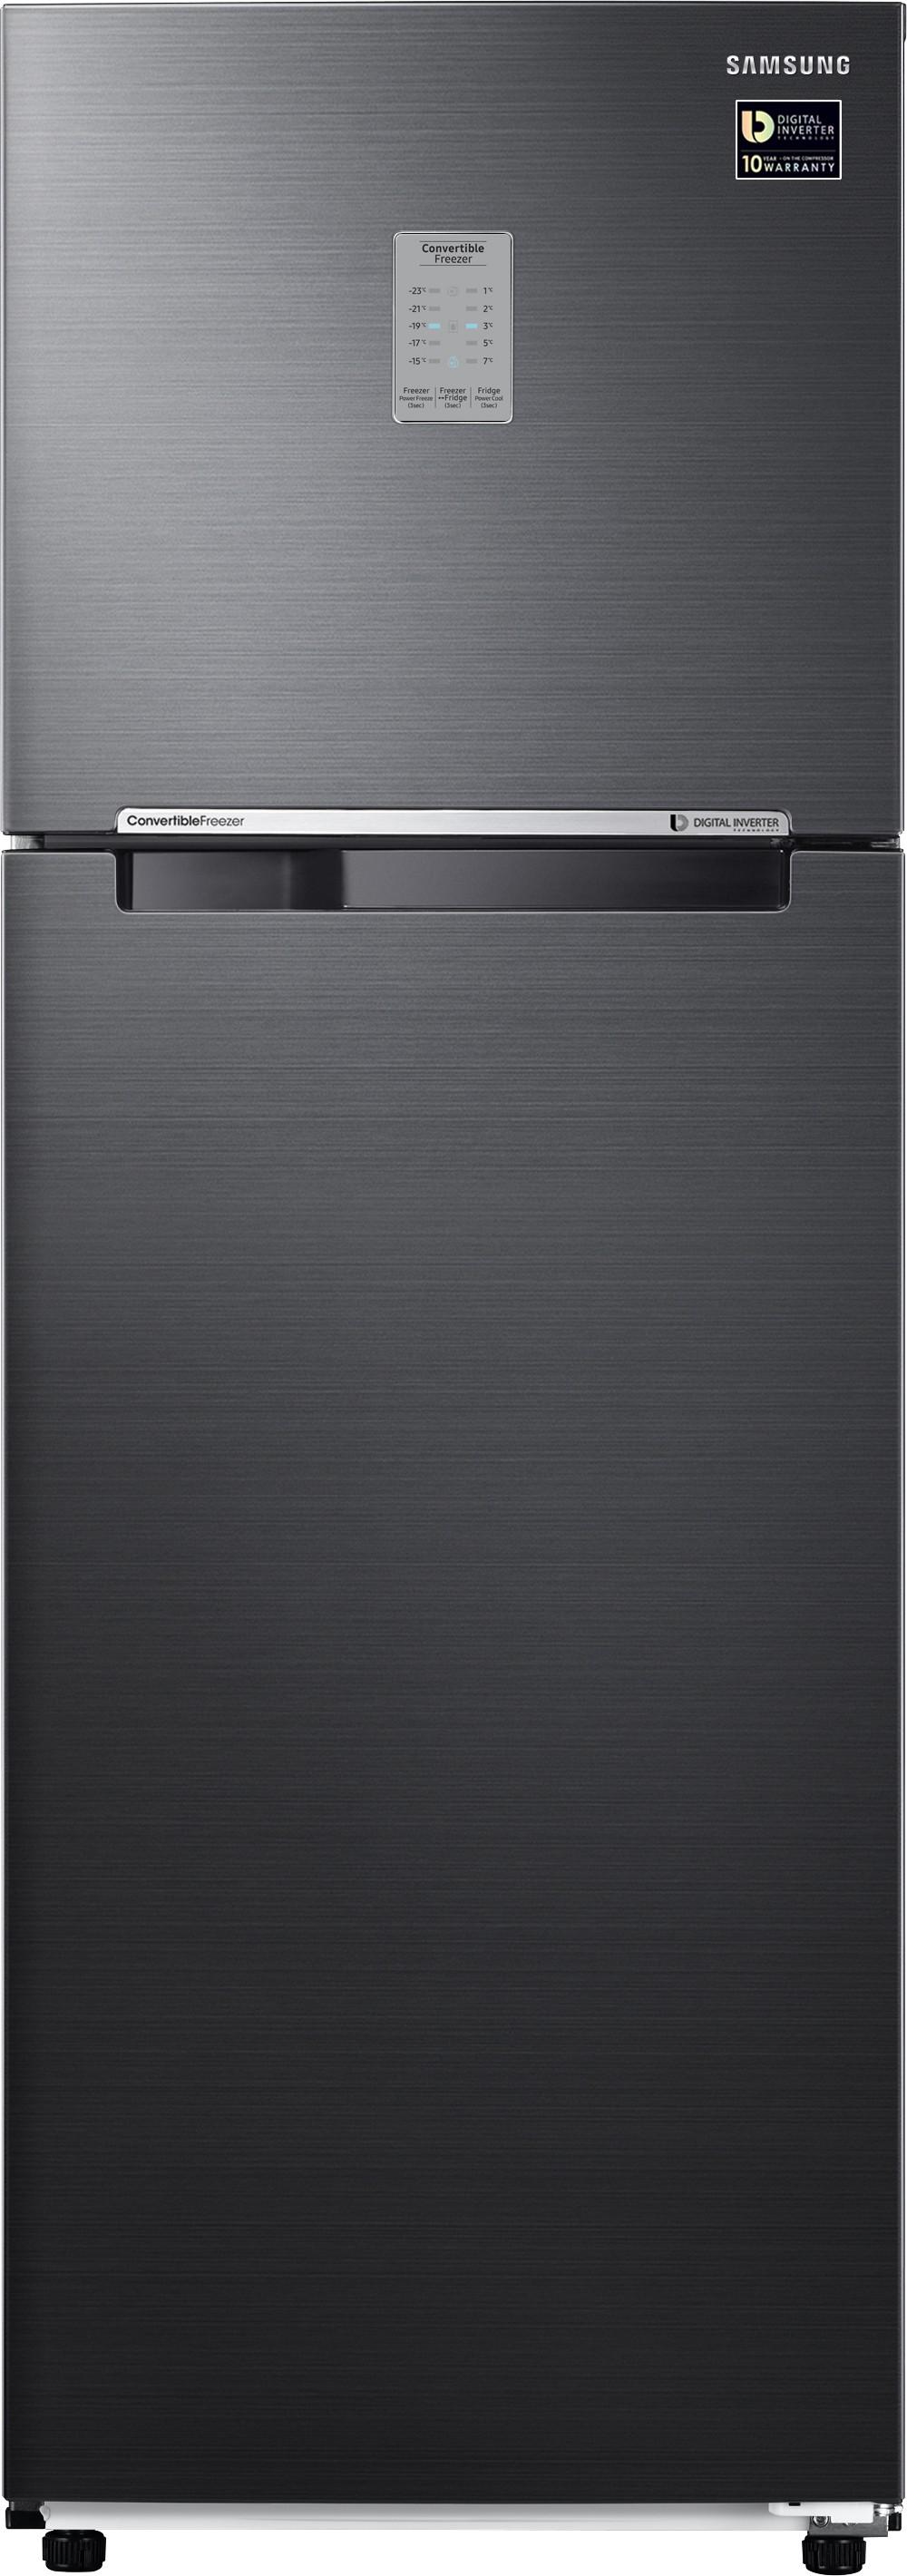 SAMSUNG 321 L Frost Free Double Door Refrigerator(RT34M3743BS/HL, Black Inox, 2017) (Samsung) Tamil Nadu Buy Online